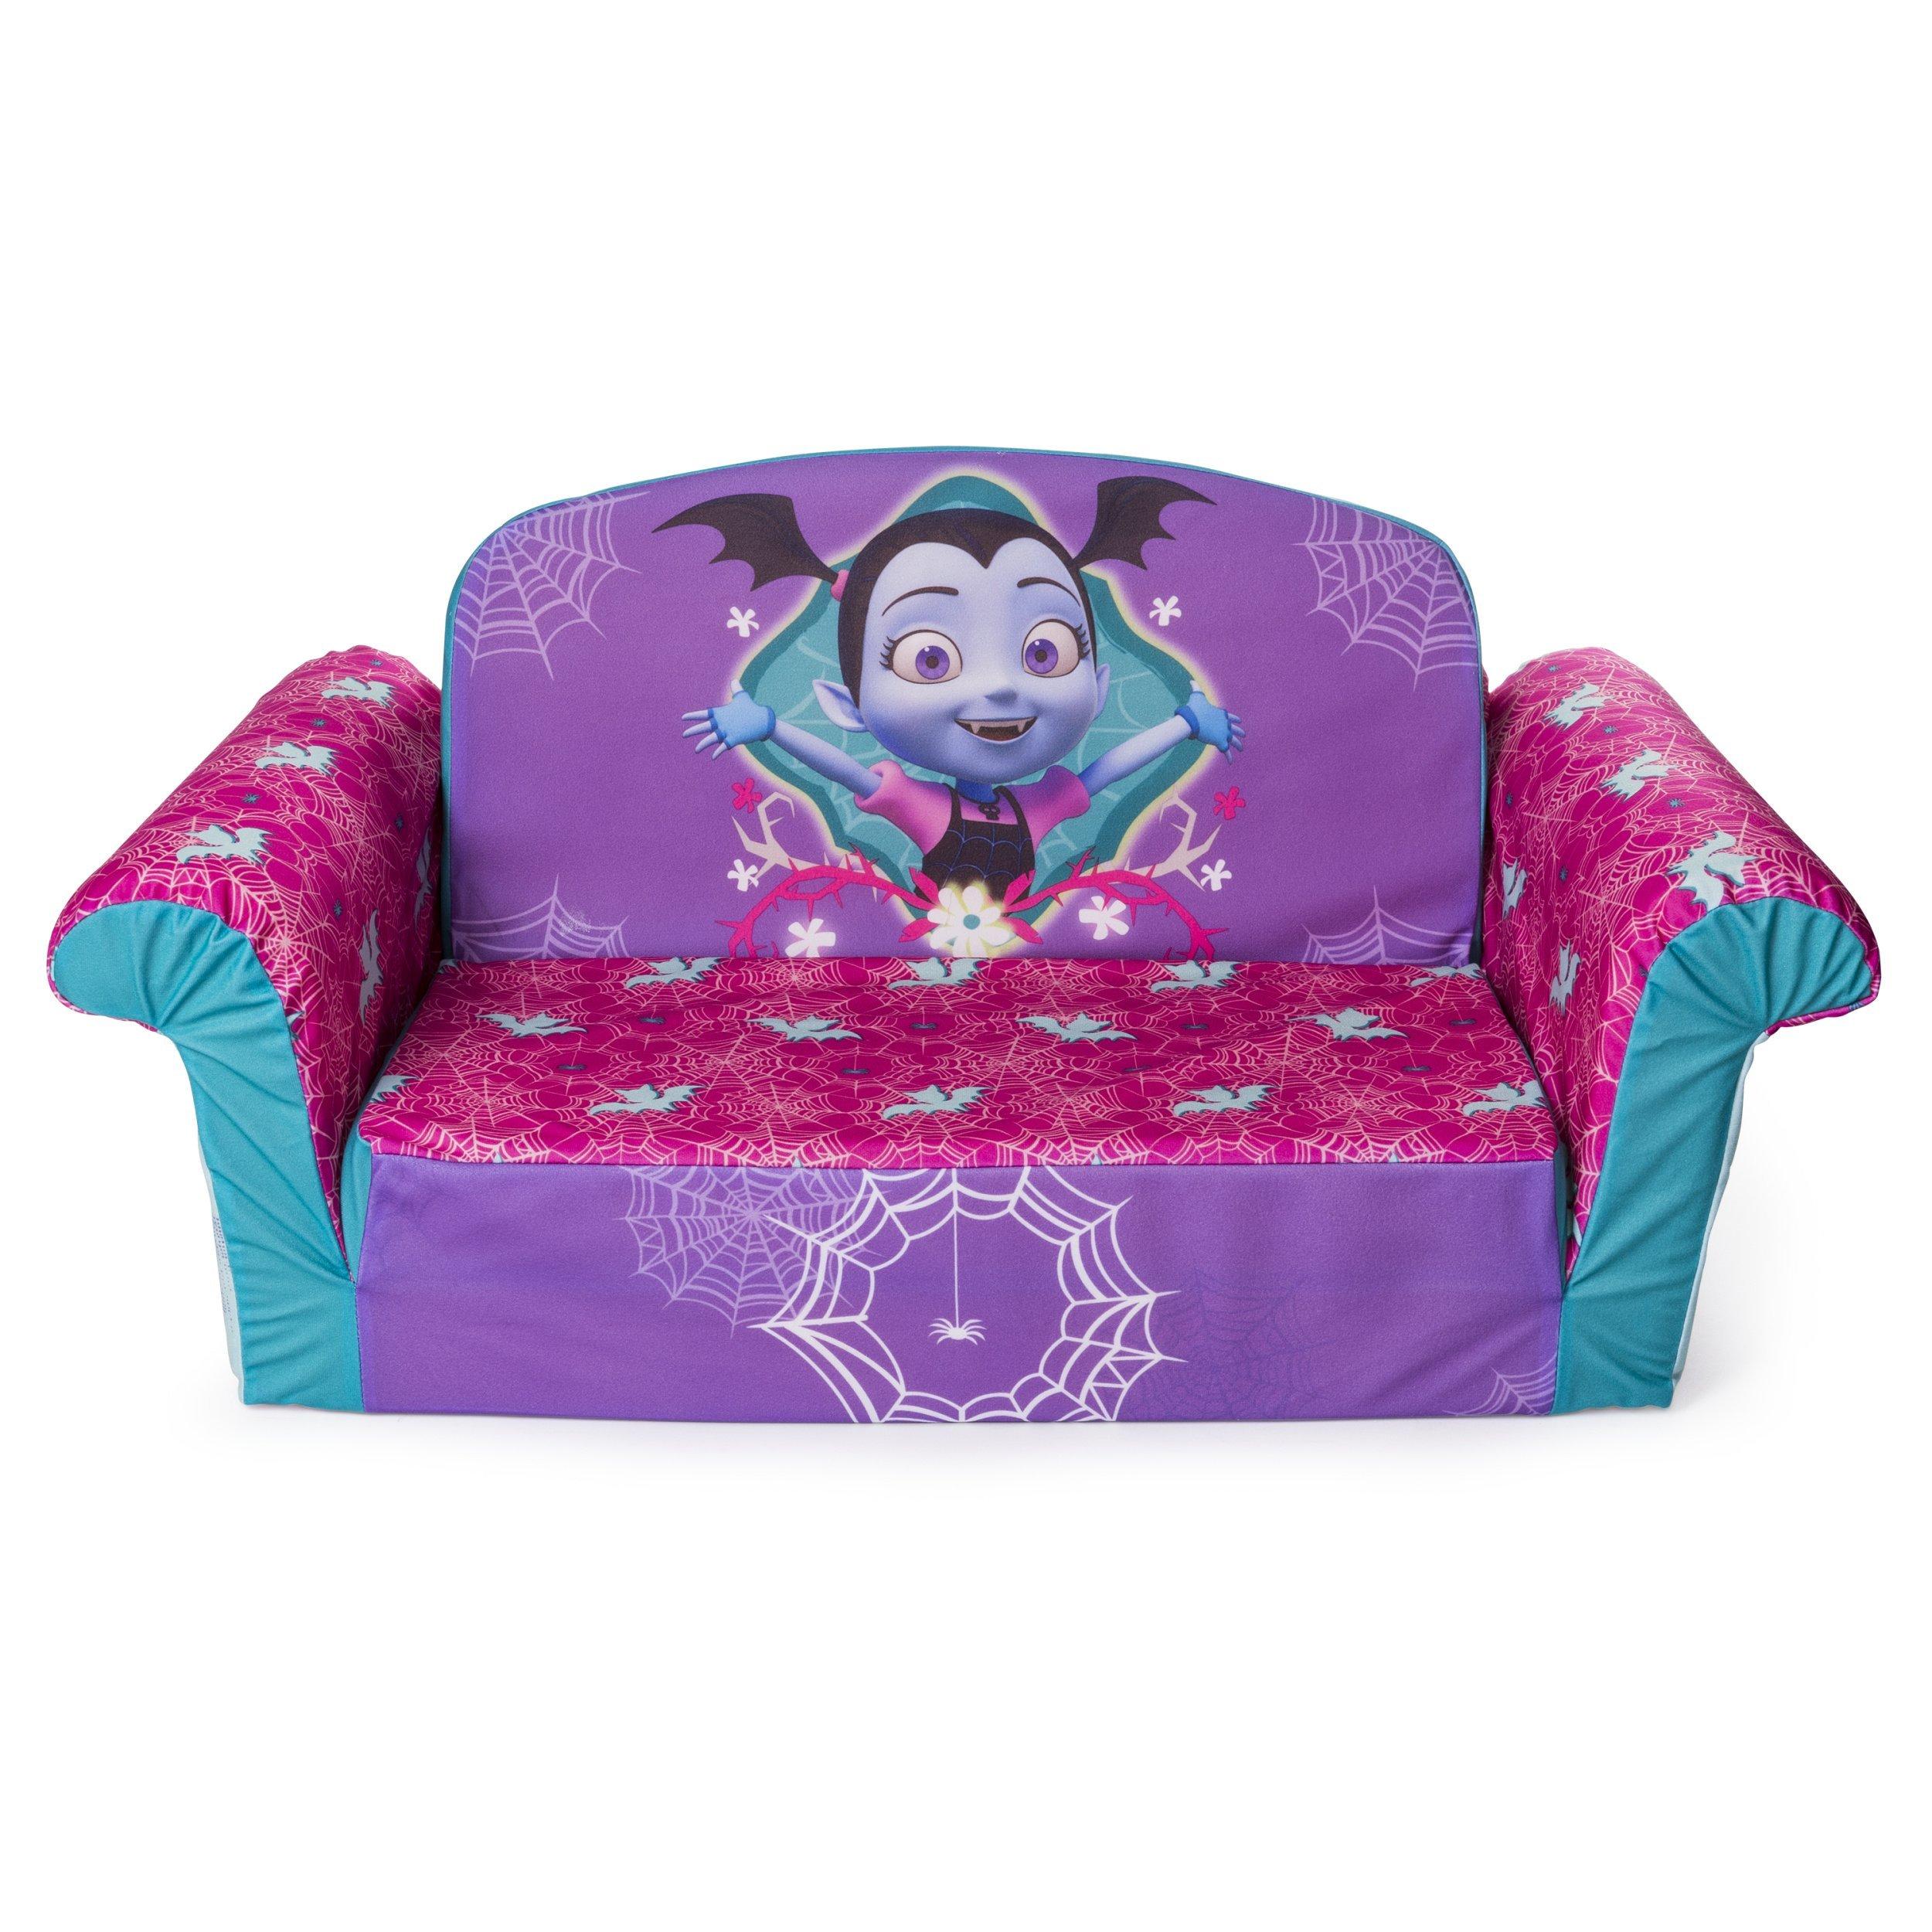 Marshmallow Furniture, Children's 2 in 1 Flip Open Foam Sofa, Disney's Vampirina, by Spin Master